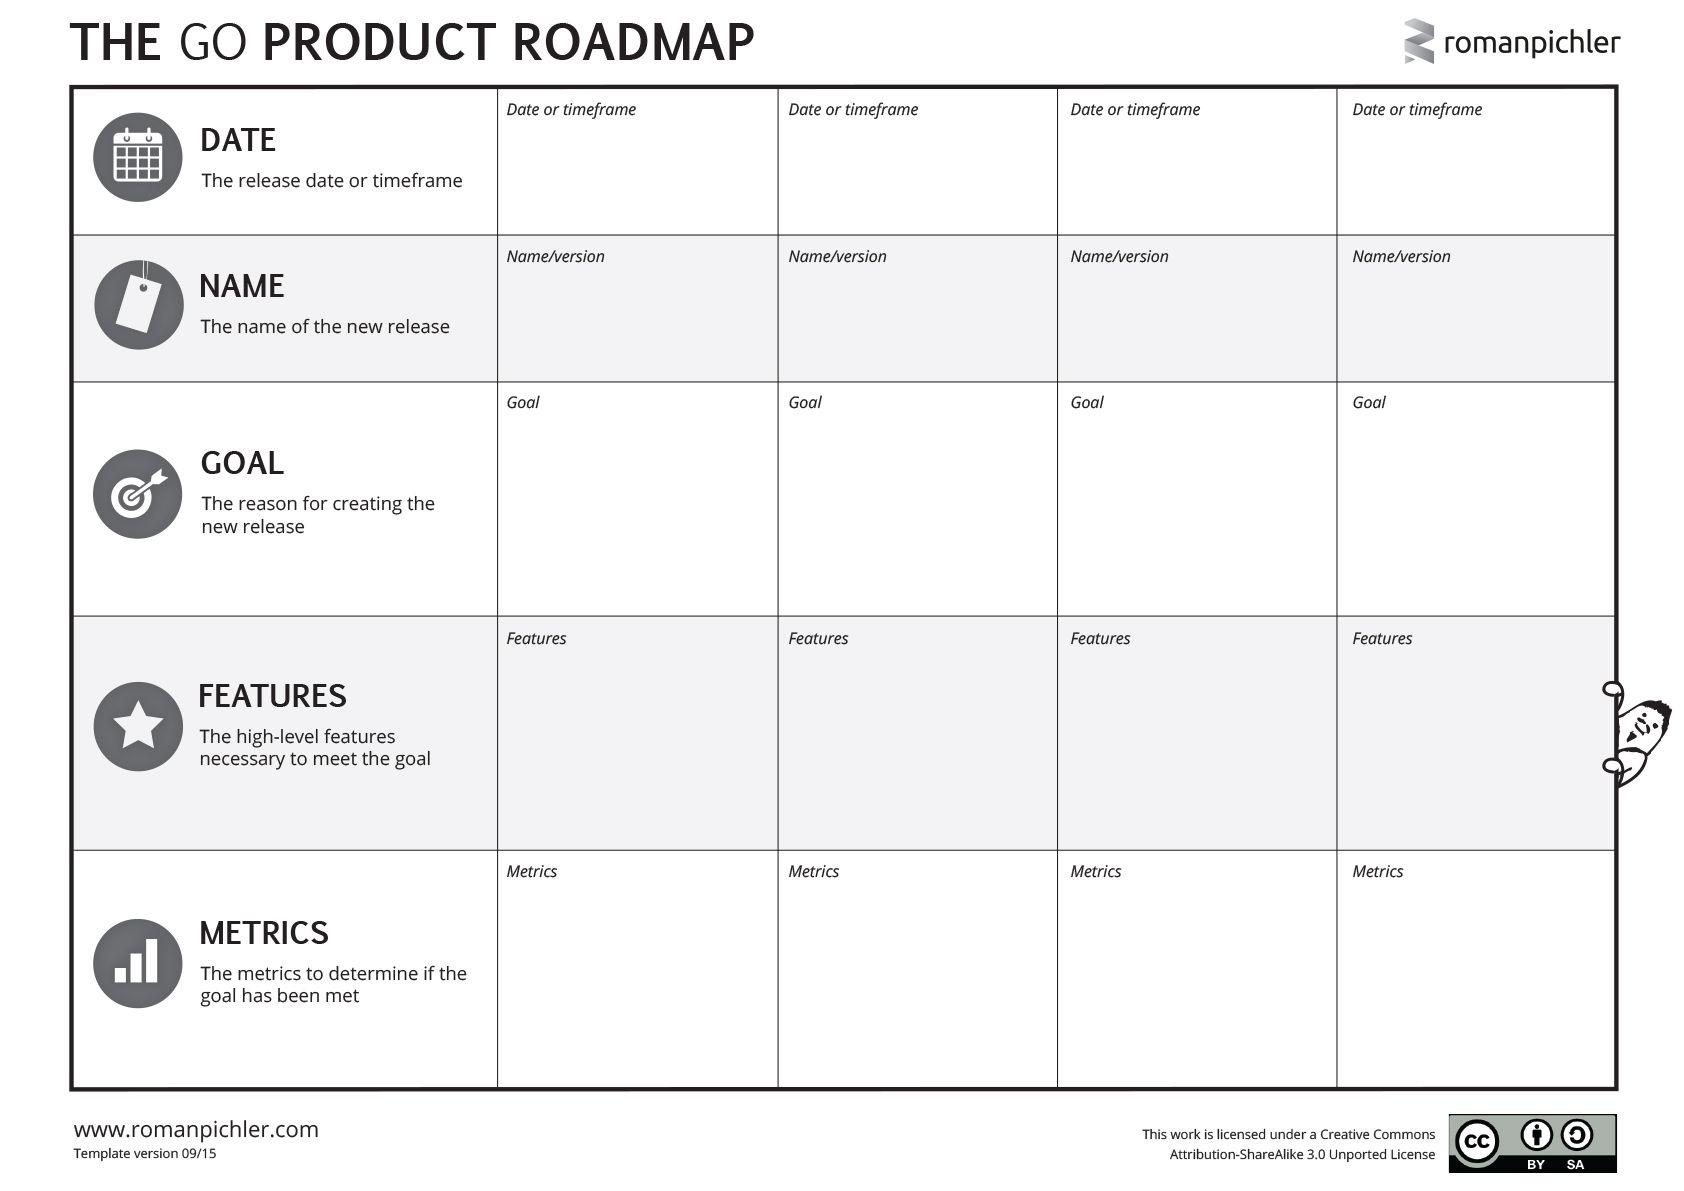 Go Product Roadmap Download